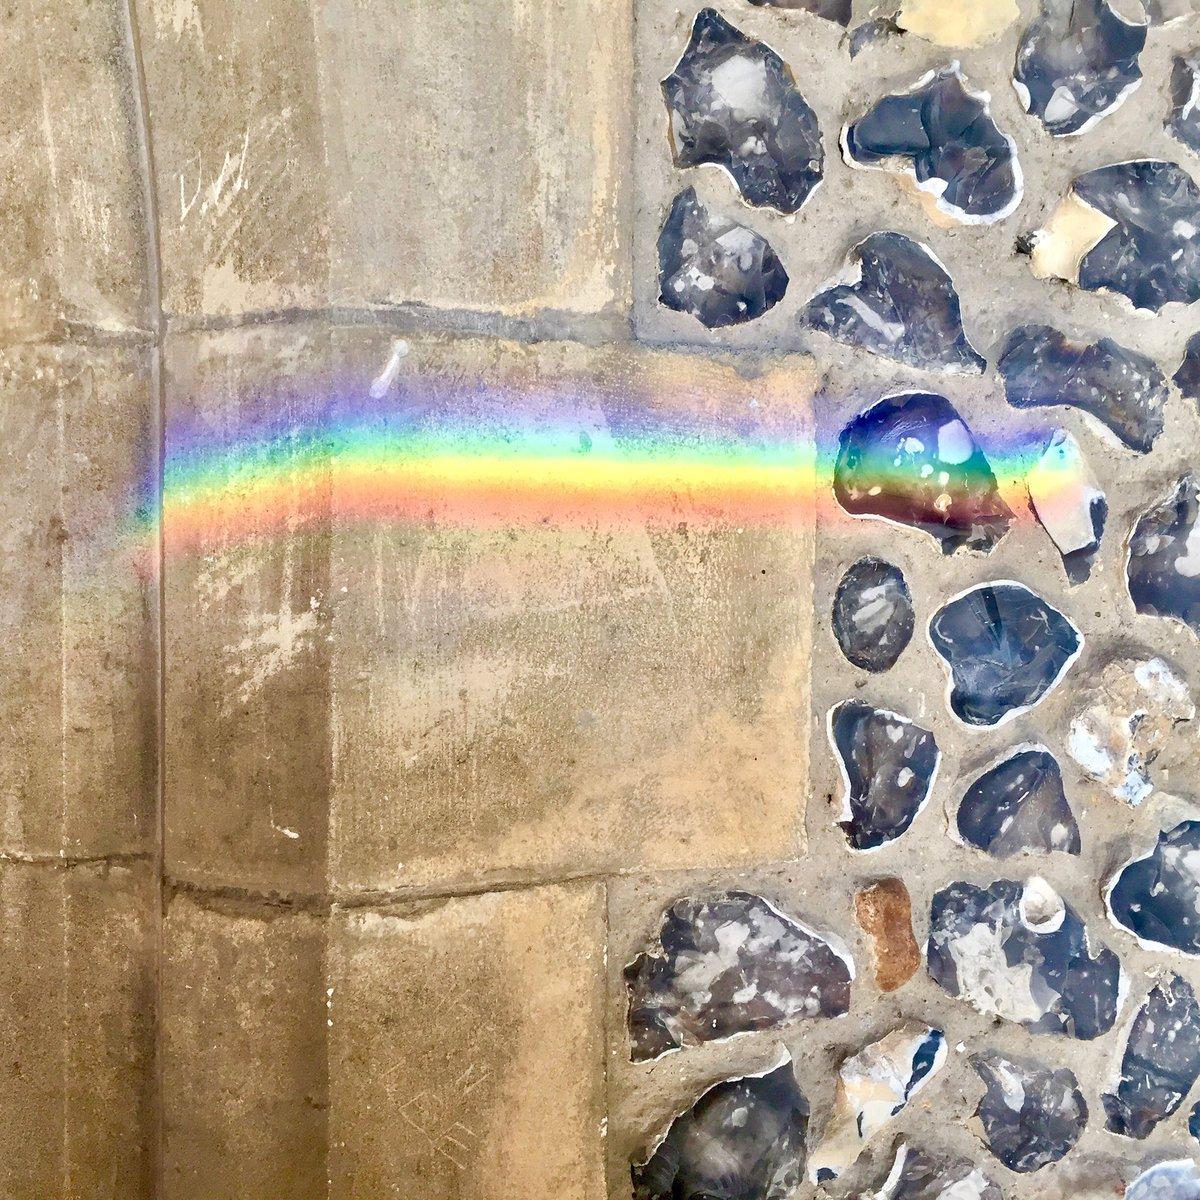 You need a drop of rain for a rainbow.  #rainbow #rain #rainbowcolours #sun #sunshine #churchporch #stmaryschurch #welwyn #stmarys #somewhereovertherainbow #nikkilewisphotography #nikkilewisphotos #hertfordshire #hertslife #village #stonewall #precious #theresalwayshope #hope